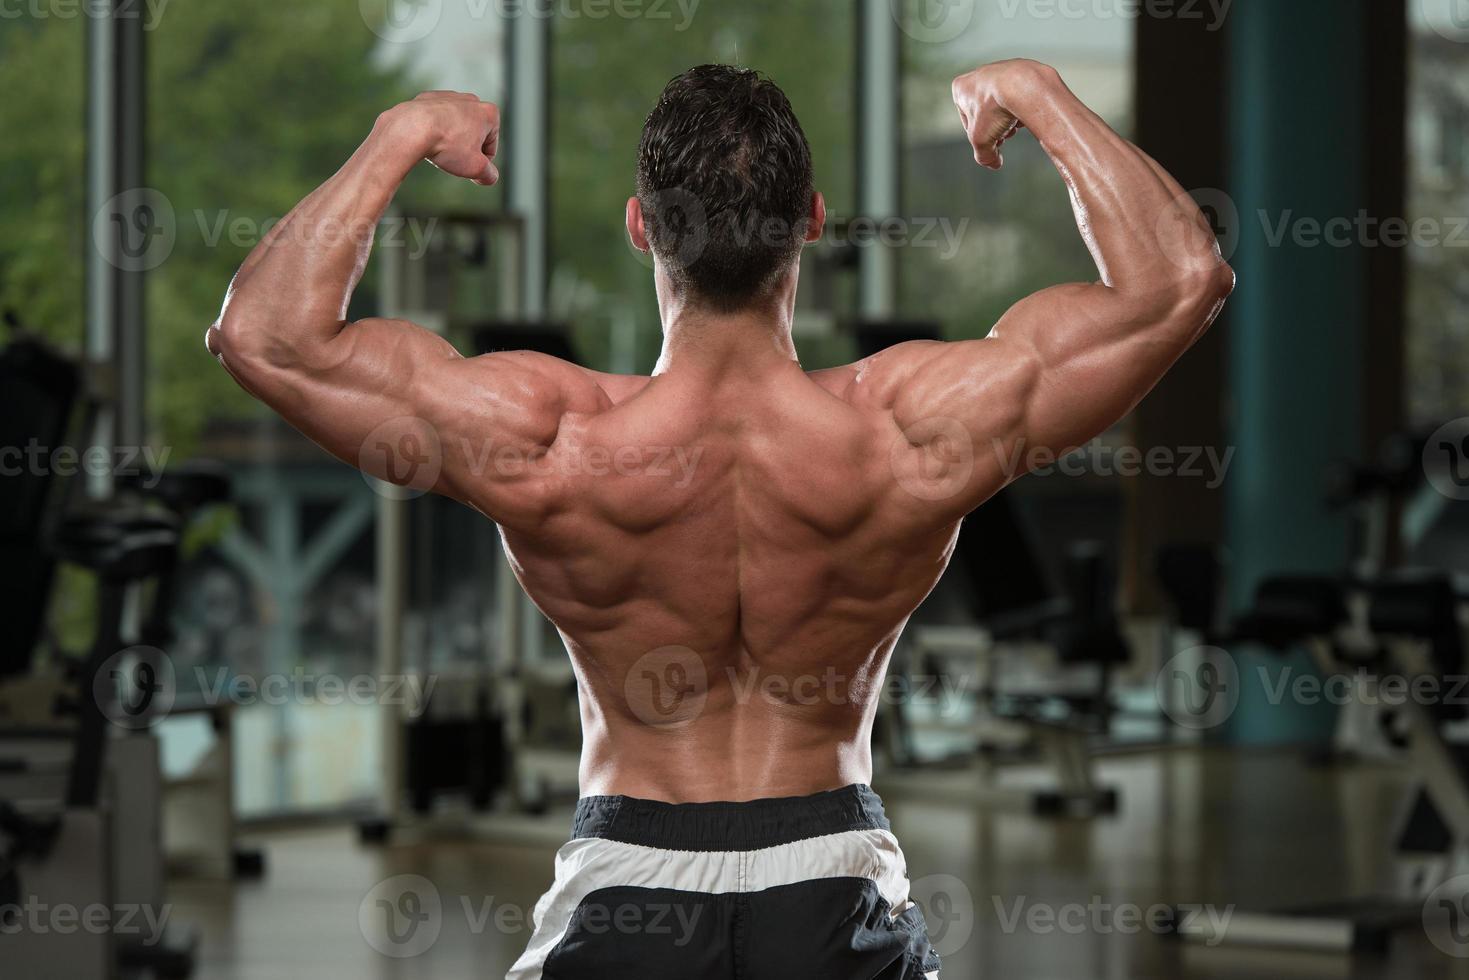 fisiculturista realizando pose traseira dupla bíceps foto